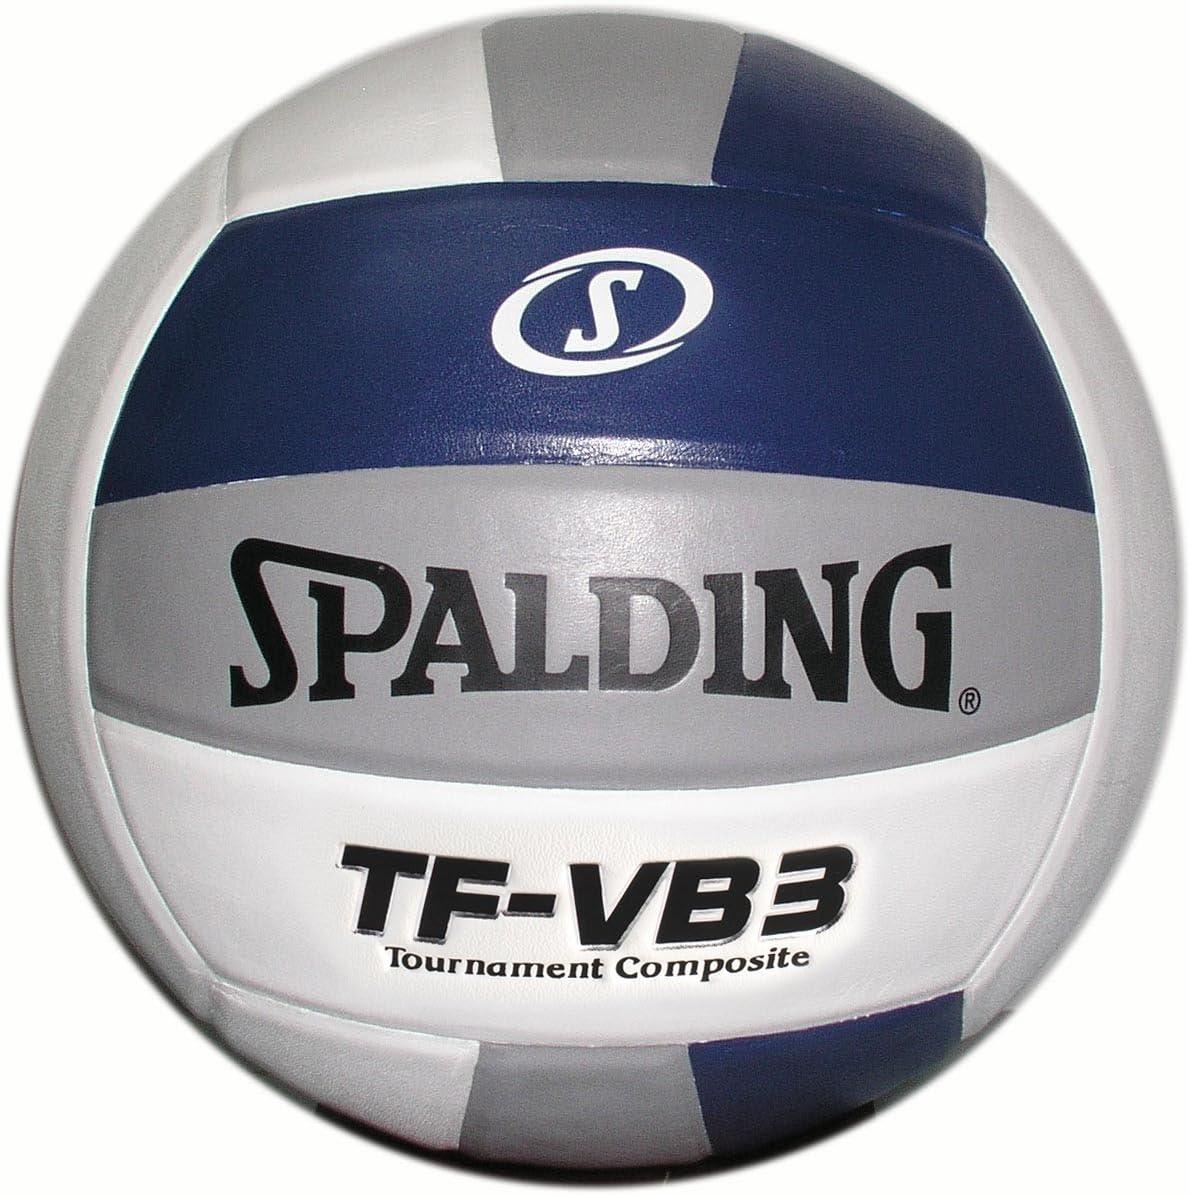 Spalding tf-vb3 NFHSバレーボール